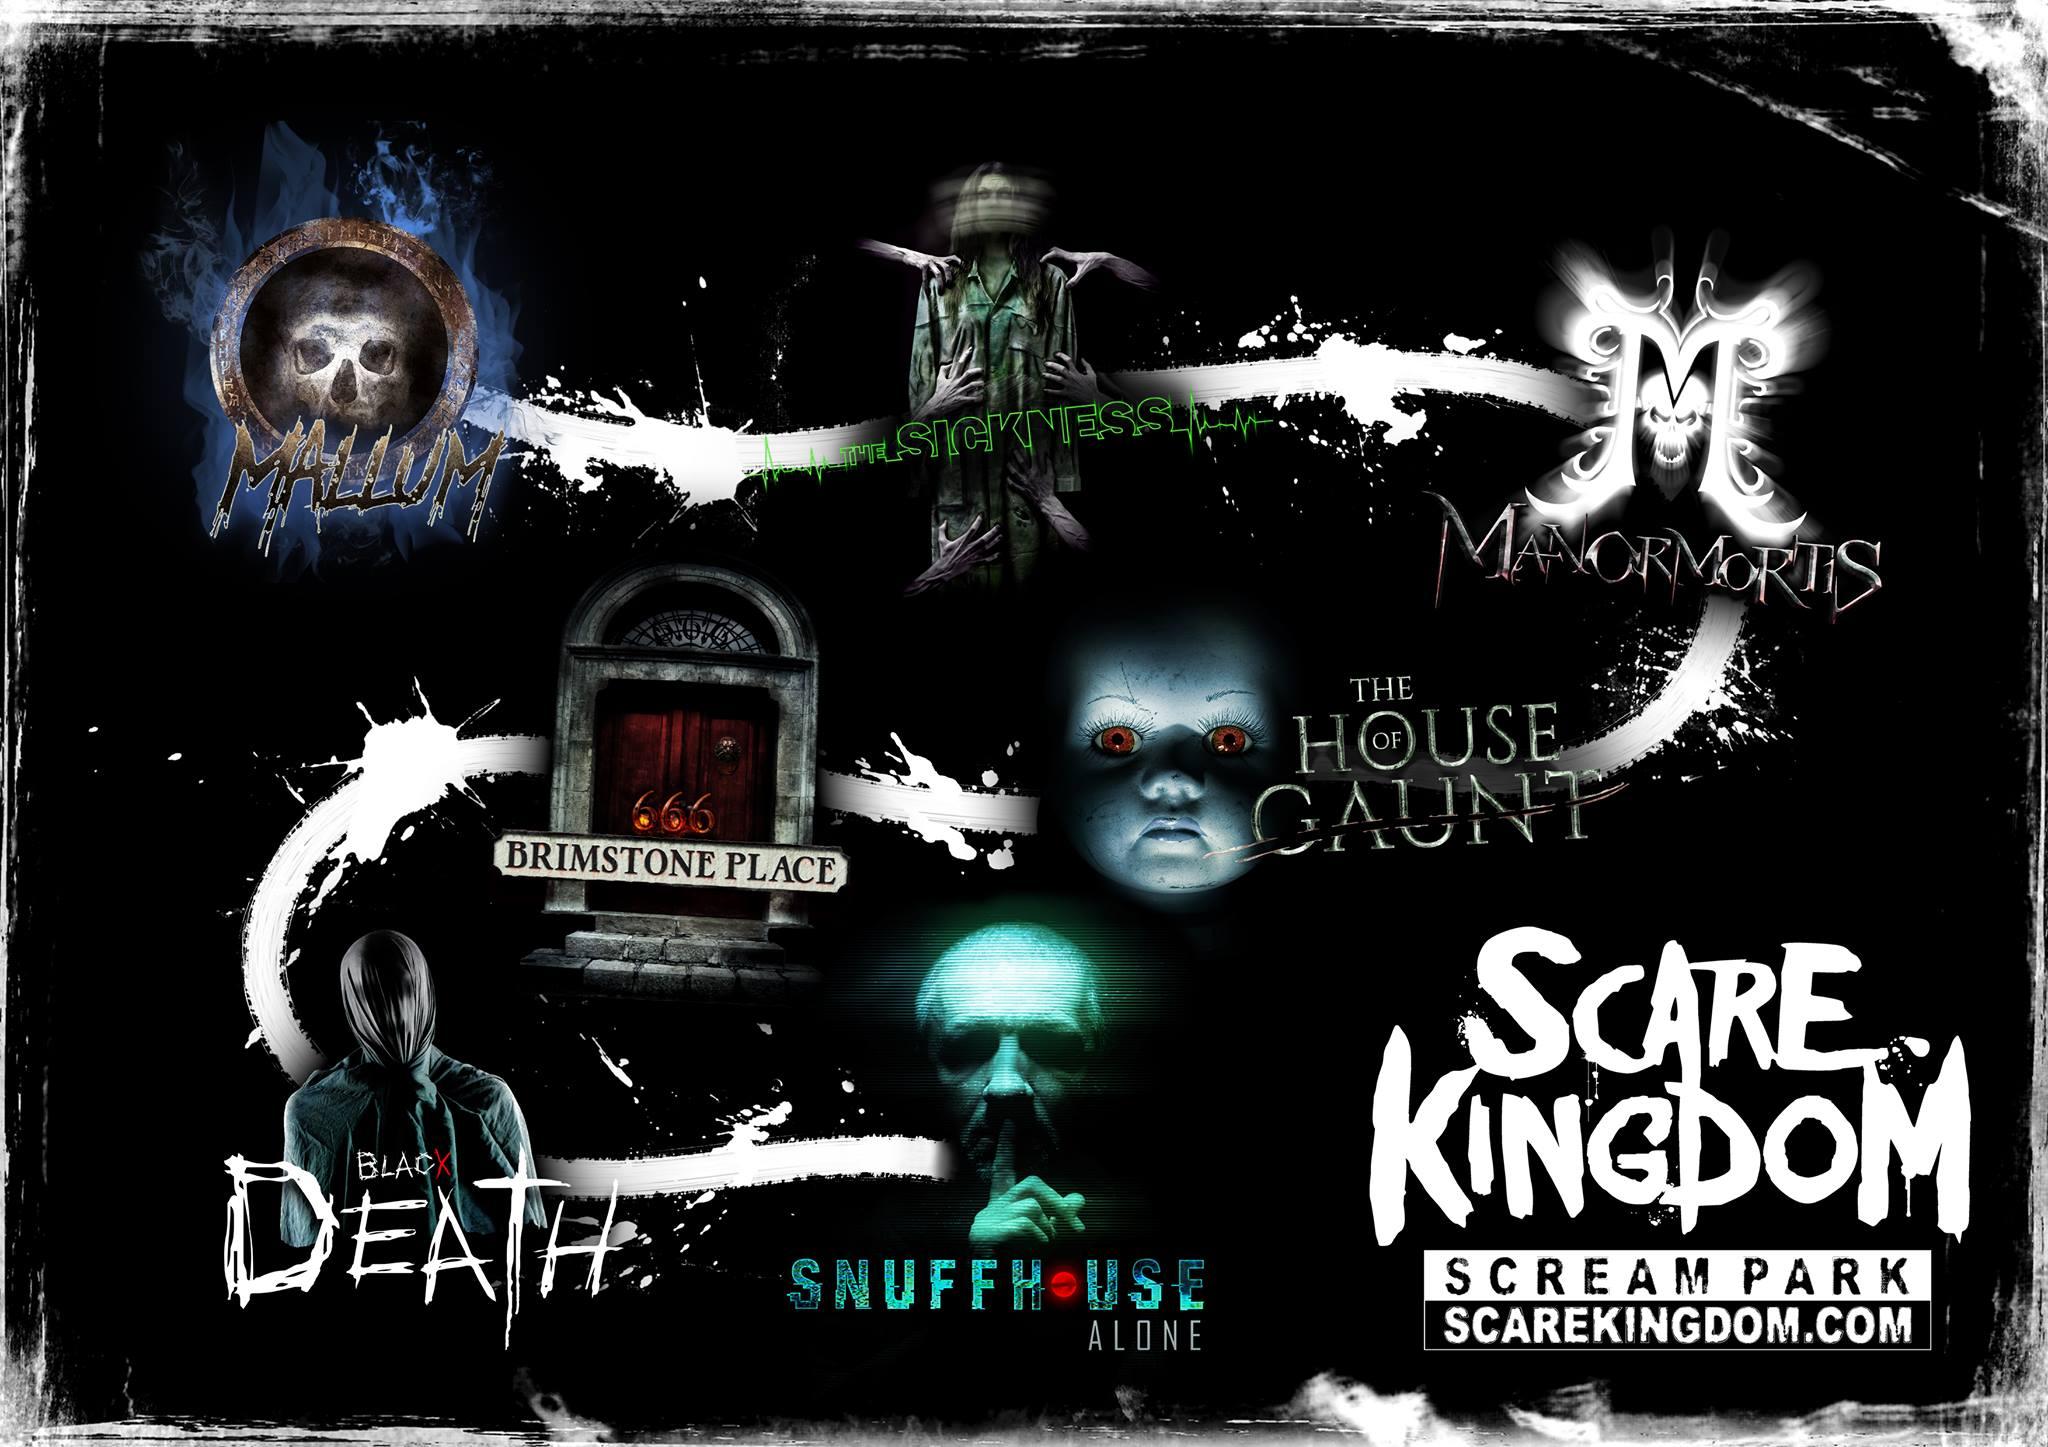 Scare Kingdom 2016 – Will you get snuffed?